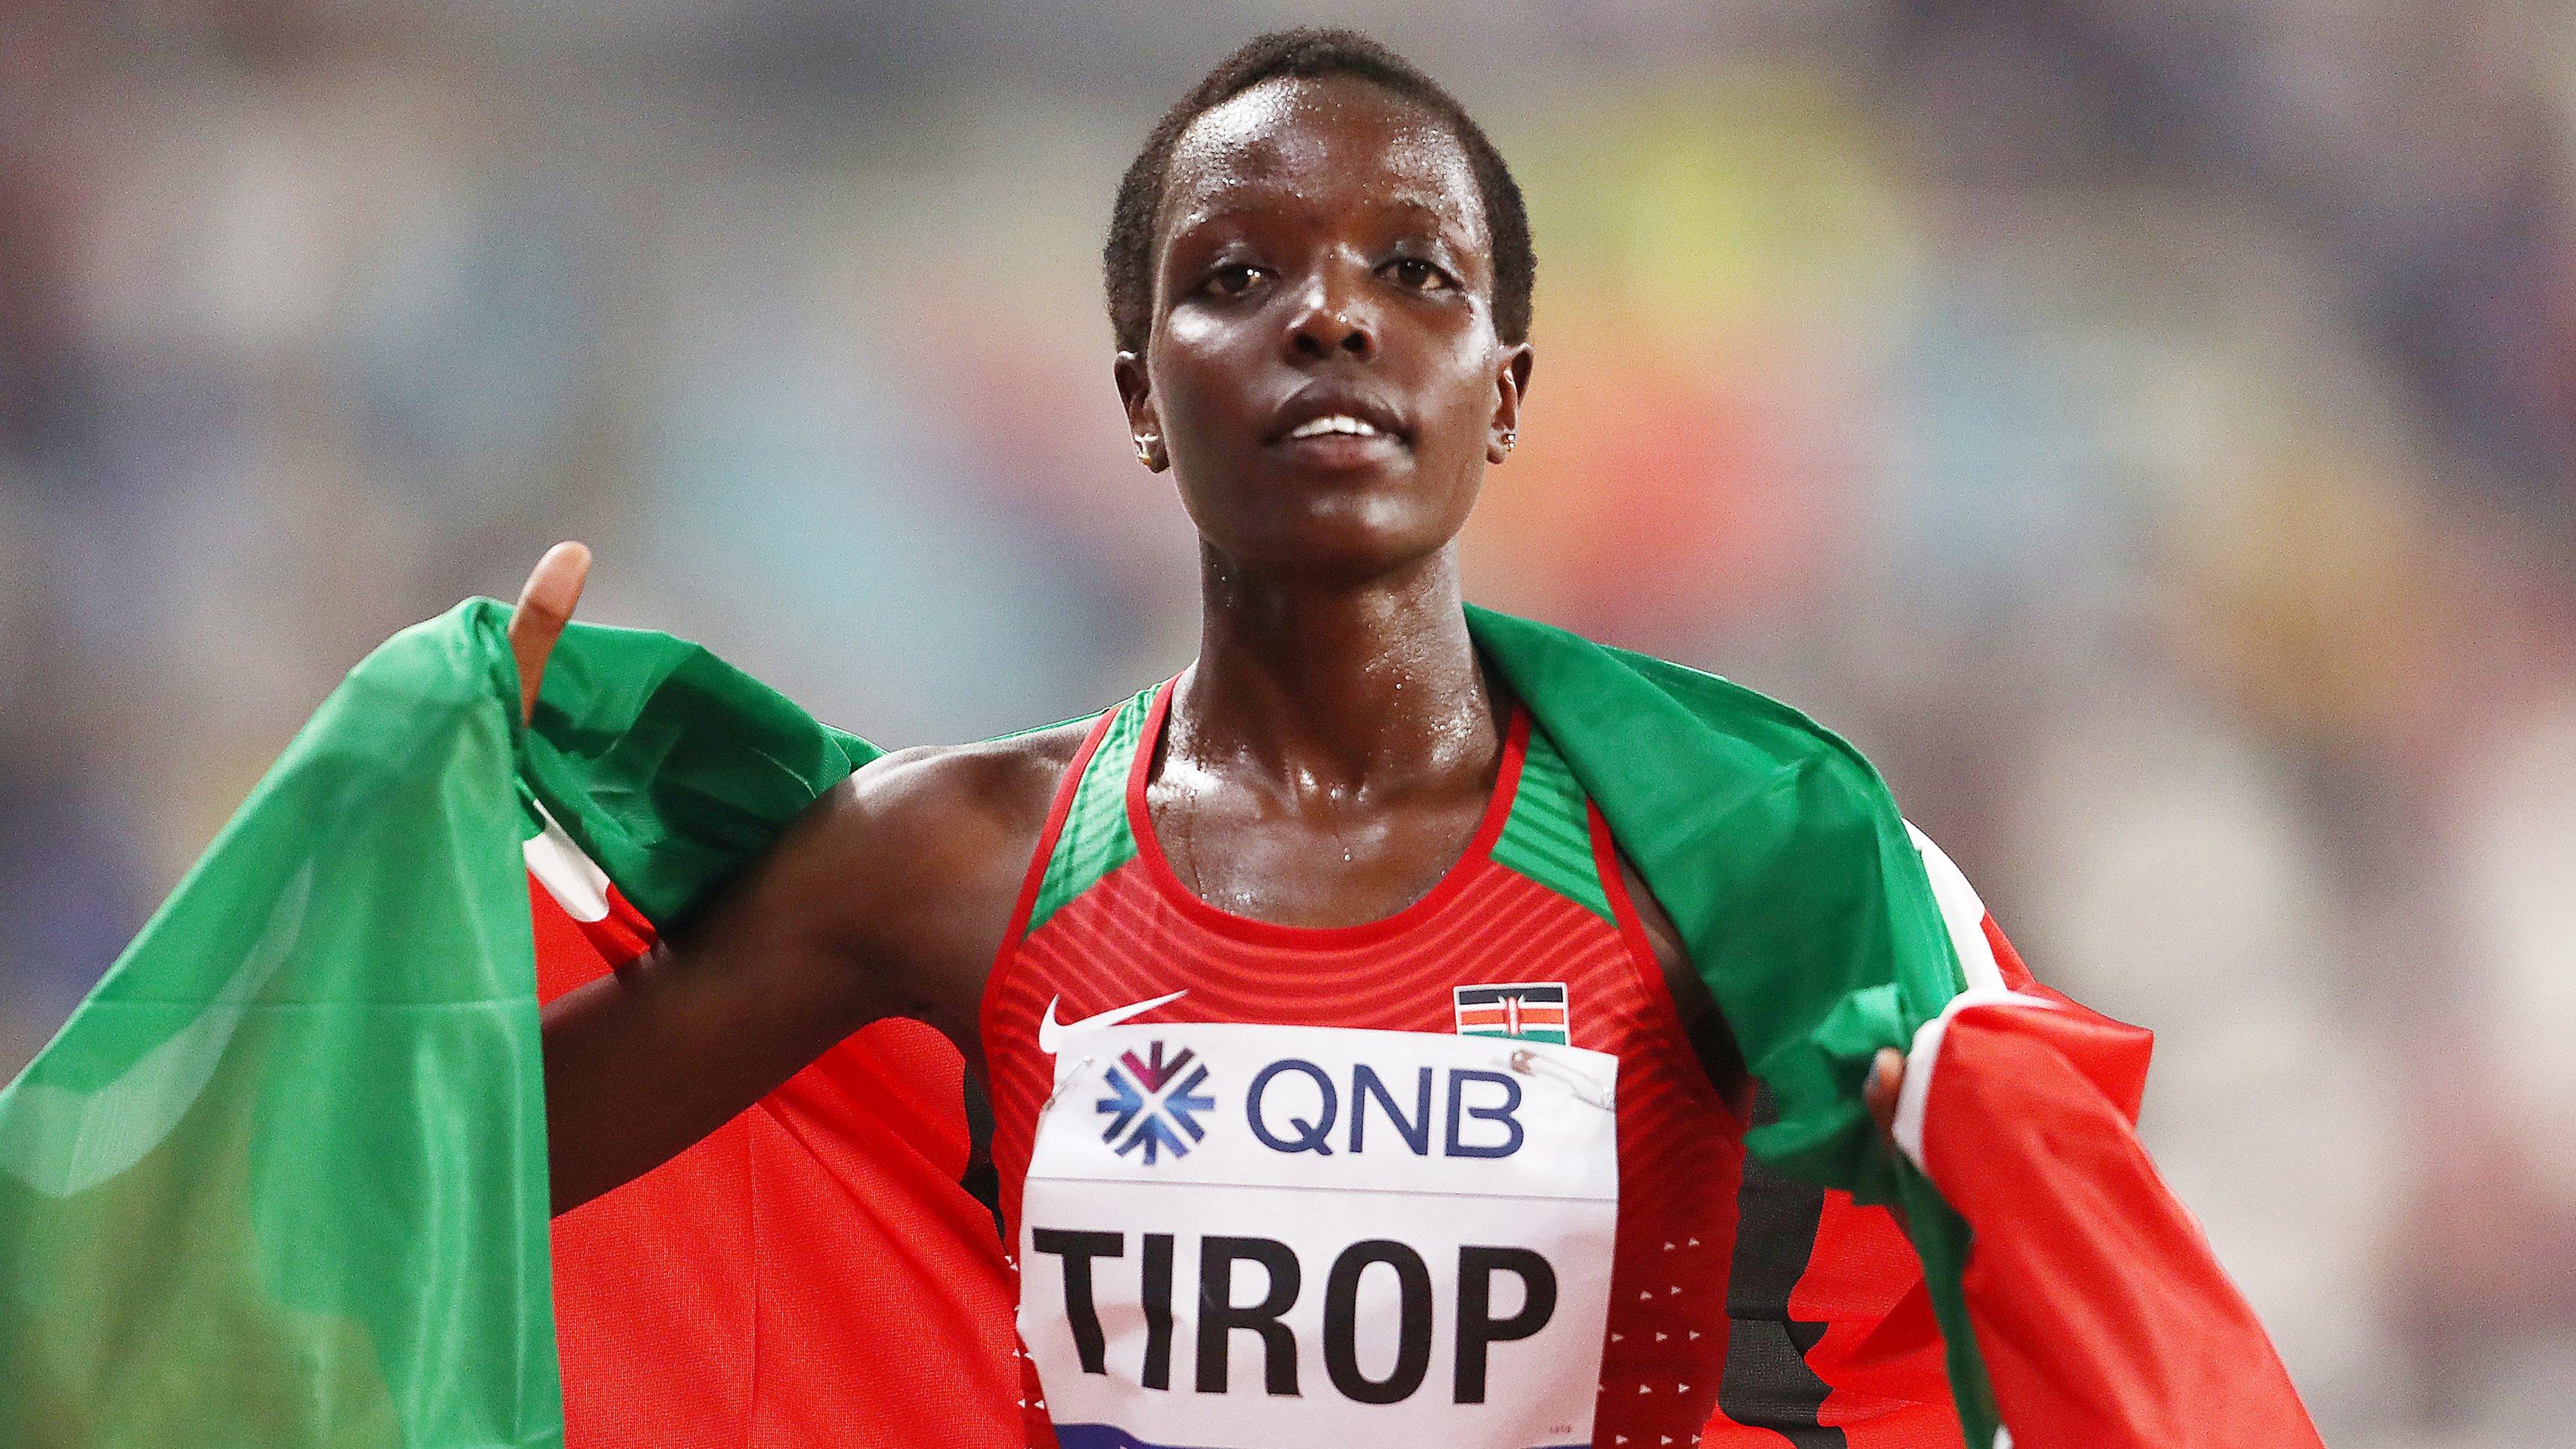 17th IAAF World Athletics Championships Doha 2019 - Day Two